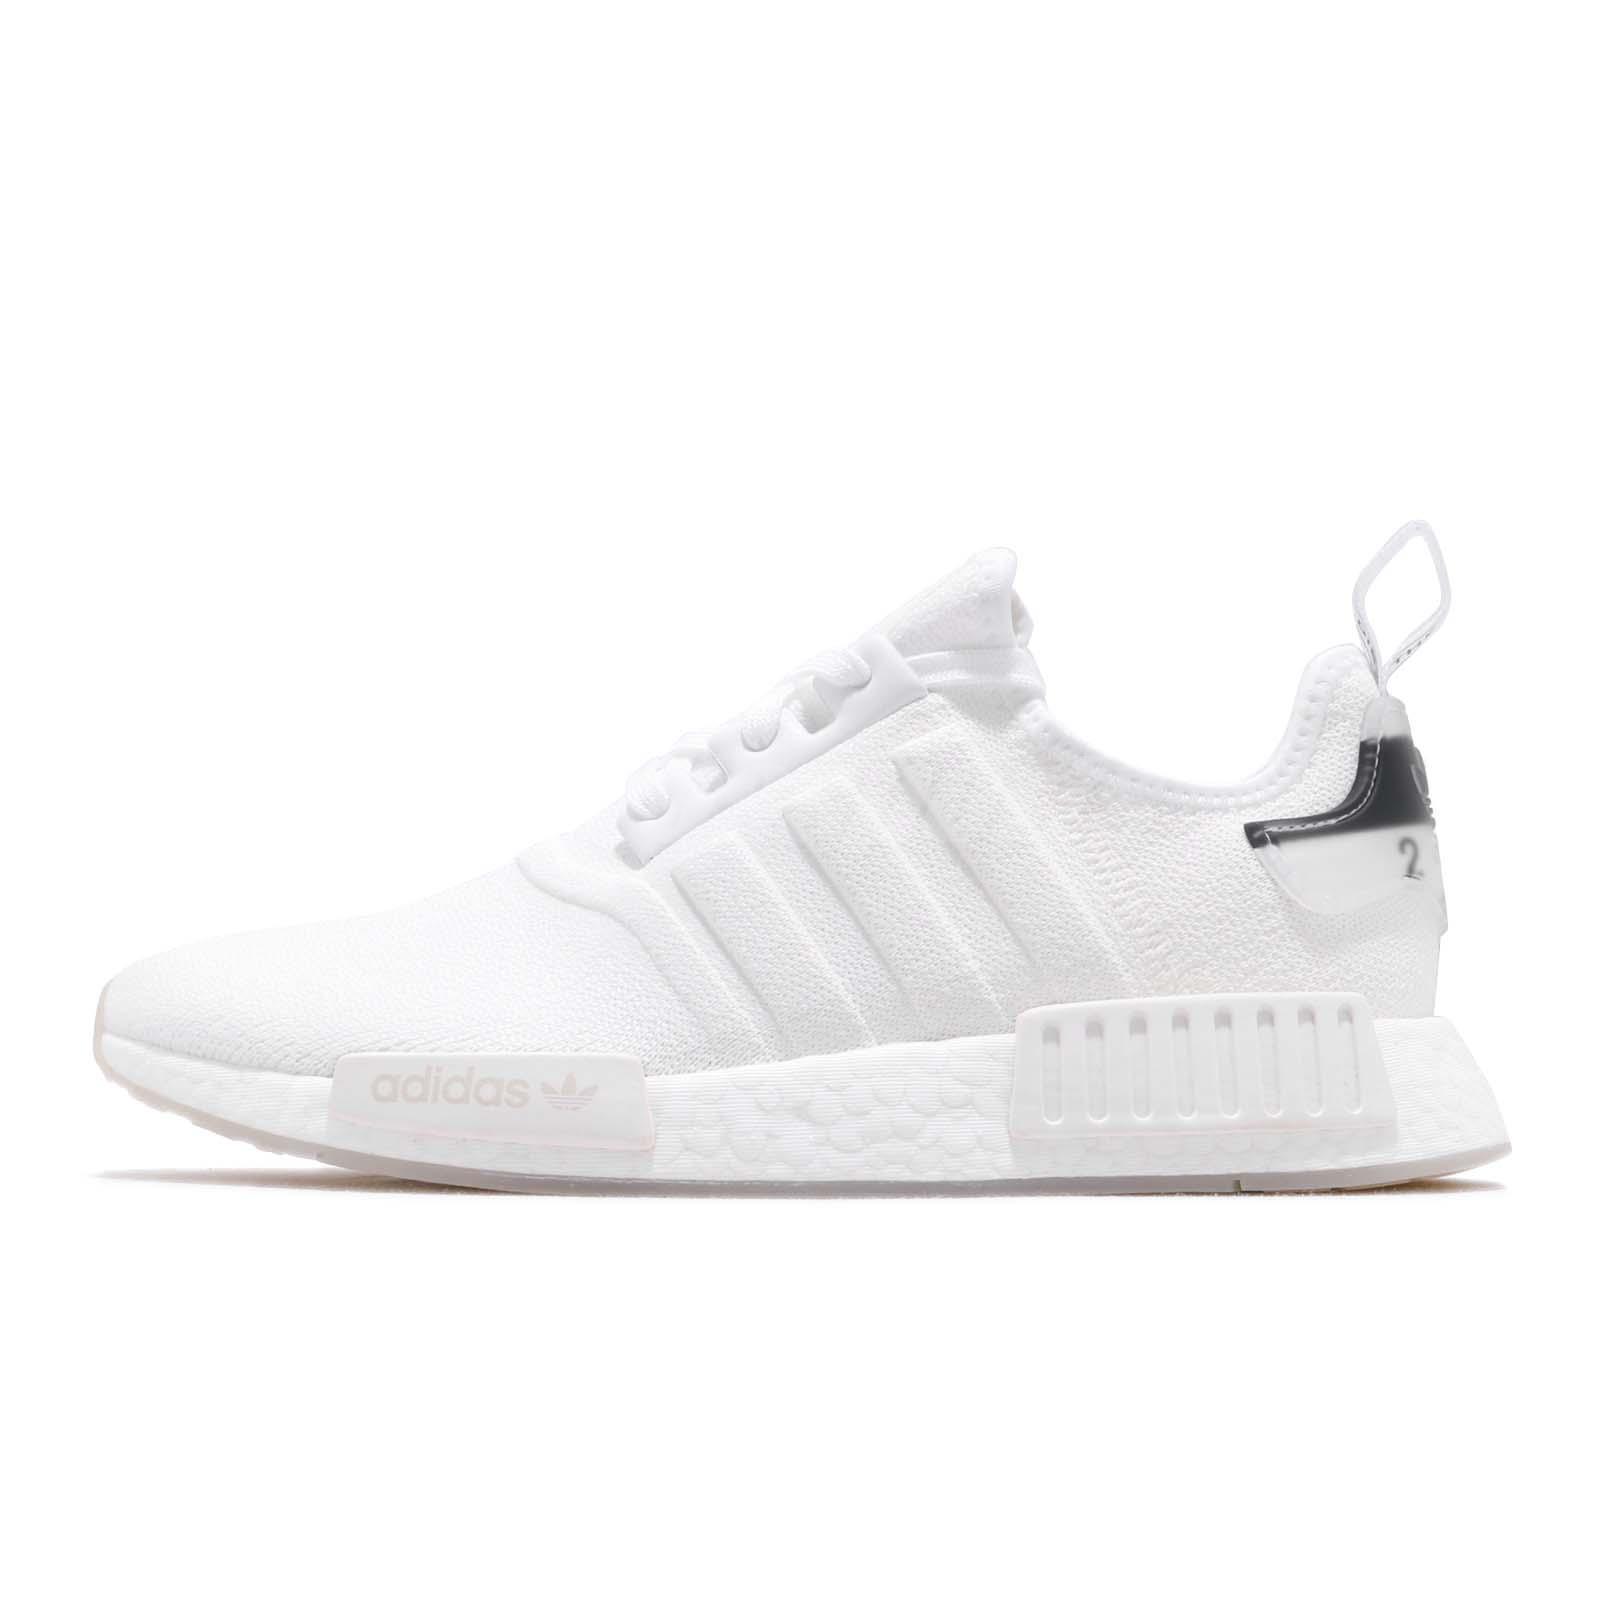 adidas Originals NMD R1 Boost White Black Men Running Shoes Sneakers BD7746 7d826b1cd